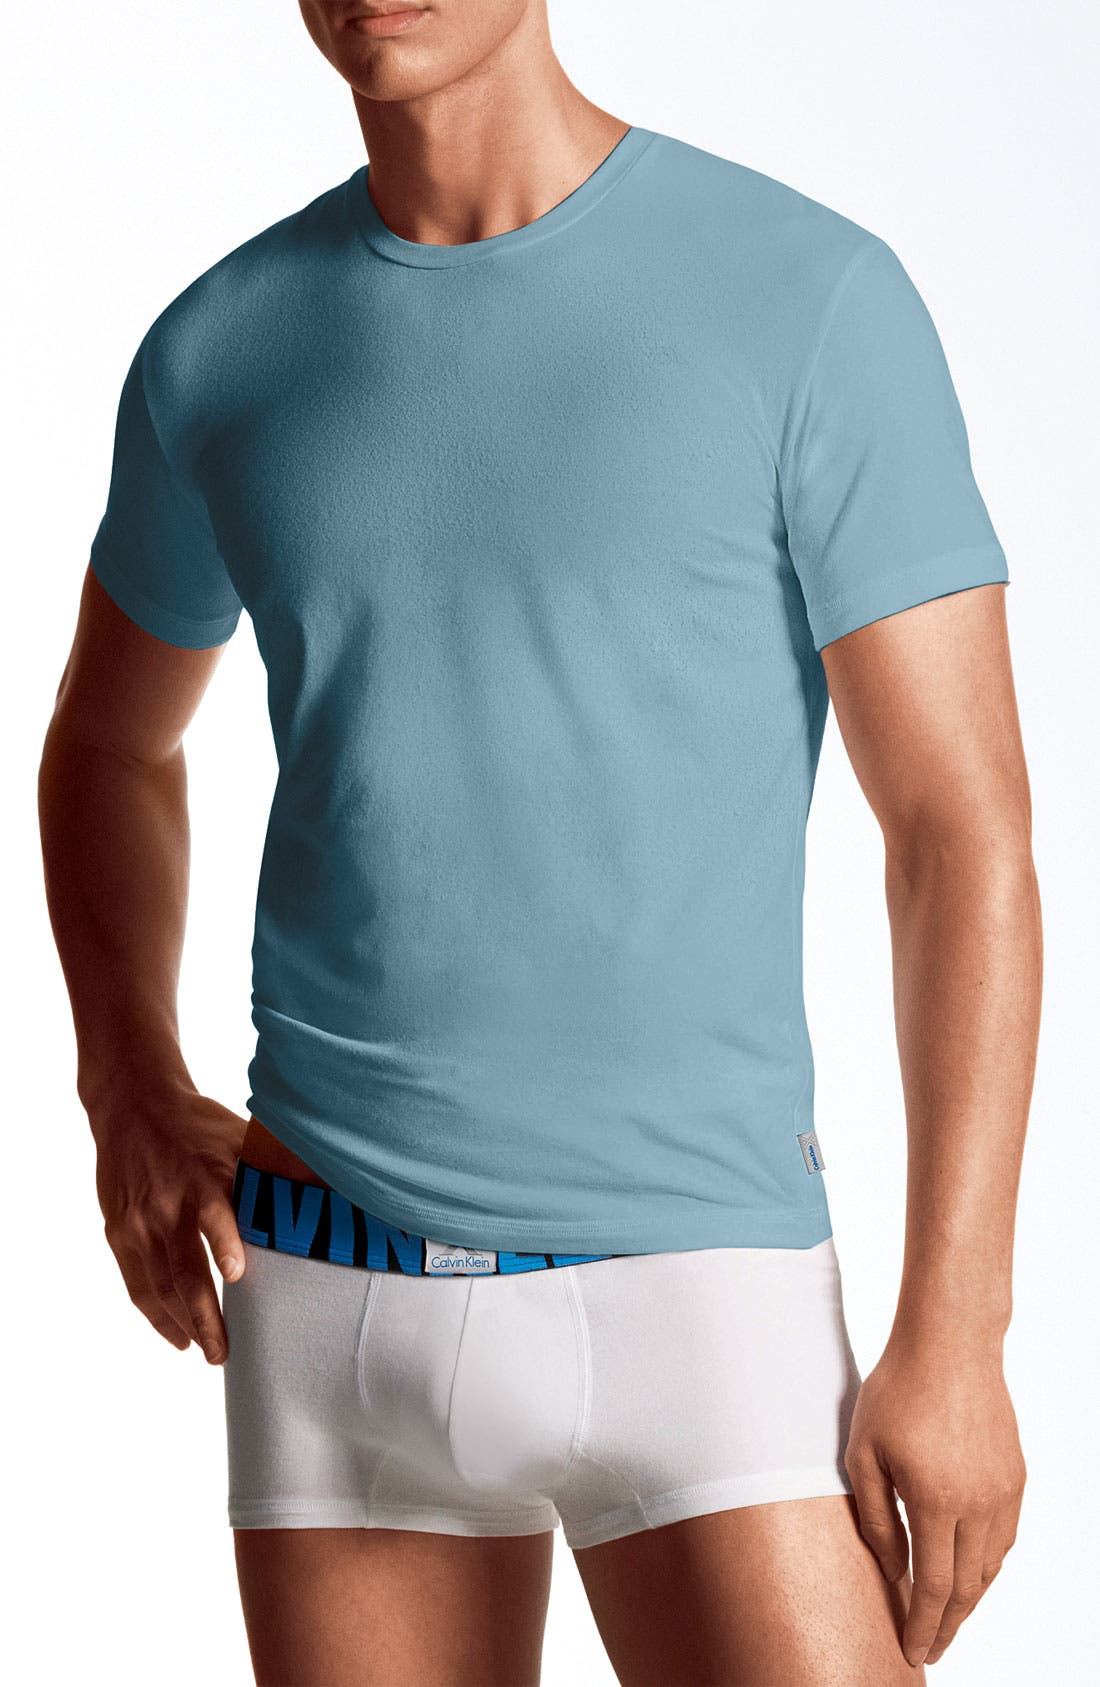 Alternate Image 1 Selected - Calvin Klein 'X' Stretch Cotton T-Shirt